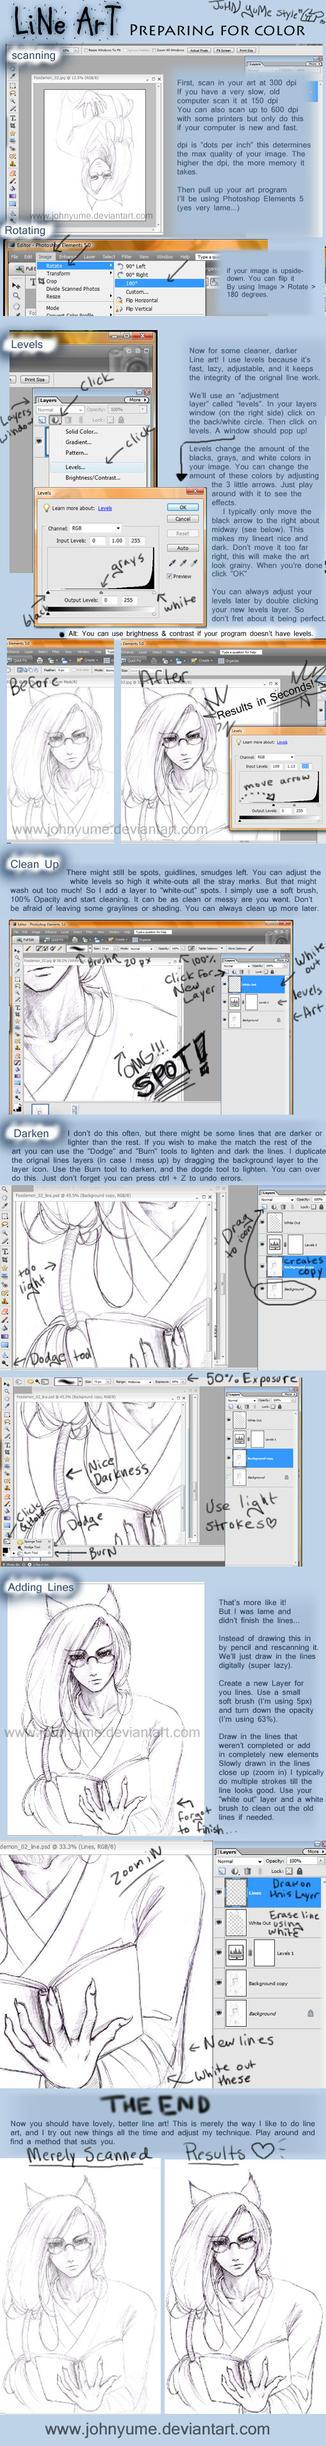 Line Art Tutorial : Line art tutorial by johnyume on deviantart